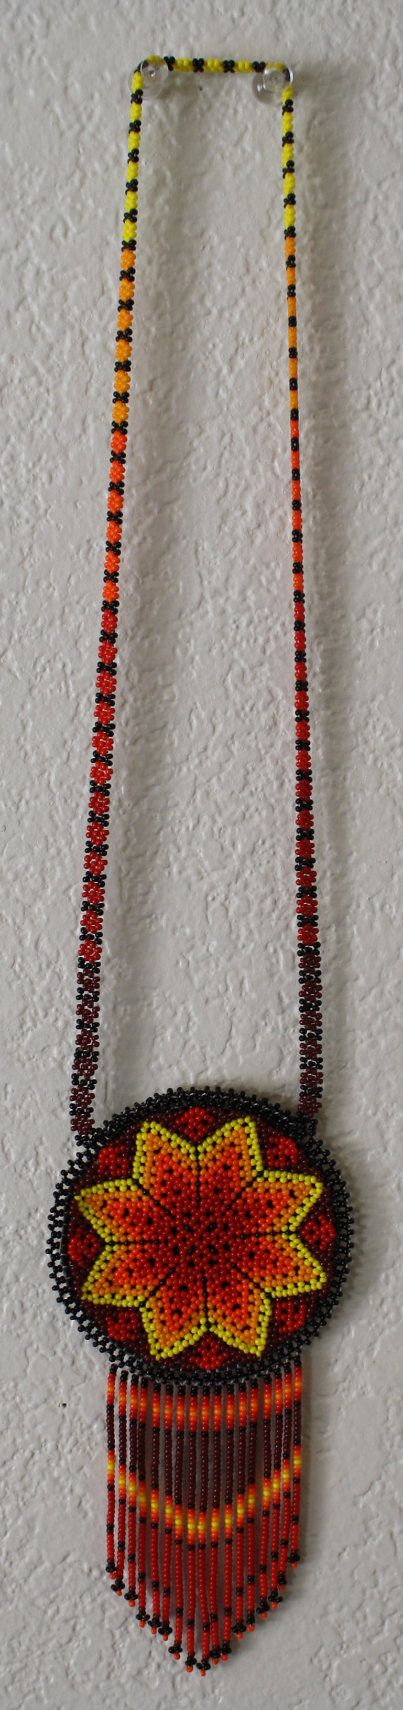 Handmade Star Pouch Beadwork Necklace por MiCasitaDeChaquira